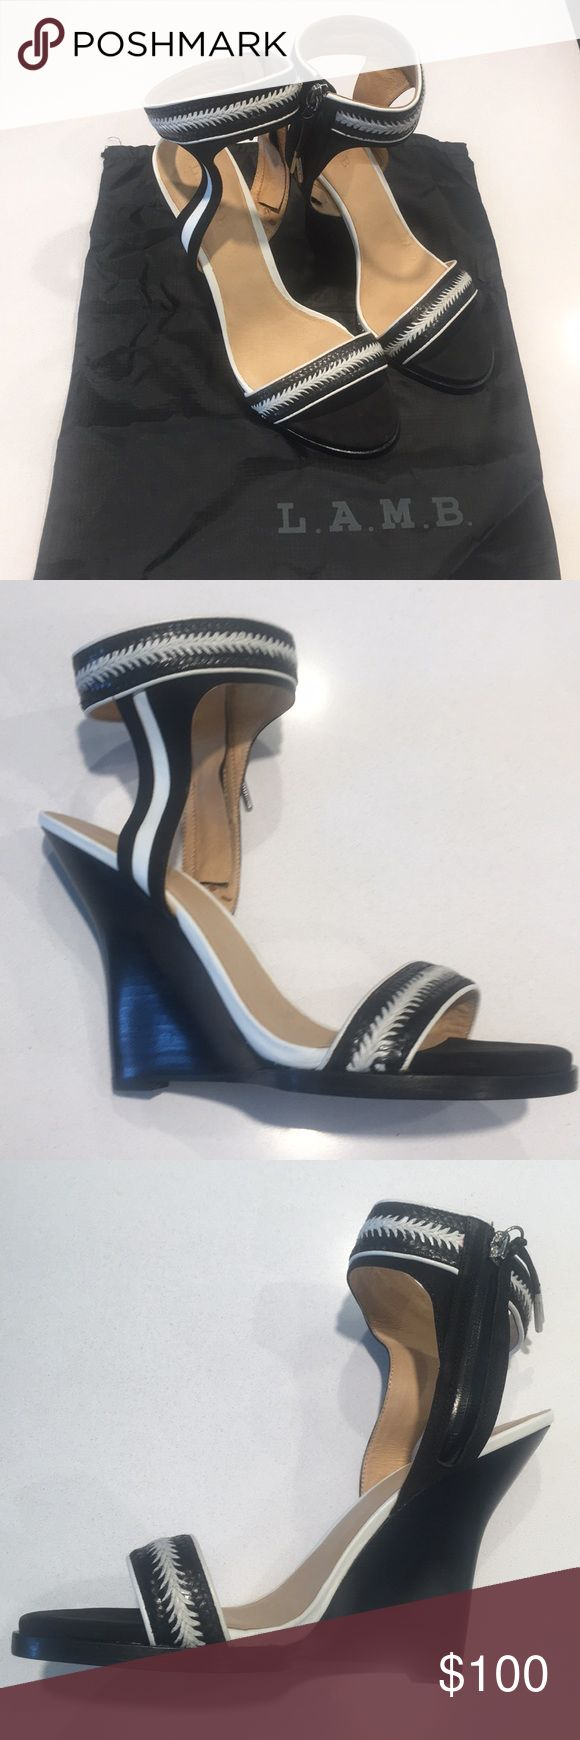 L.A.M.B shoes NWBox Black and white LAMB shoes. Never worn! Size 10 L.A.M.B. Shoes